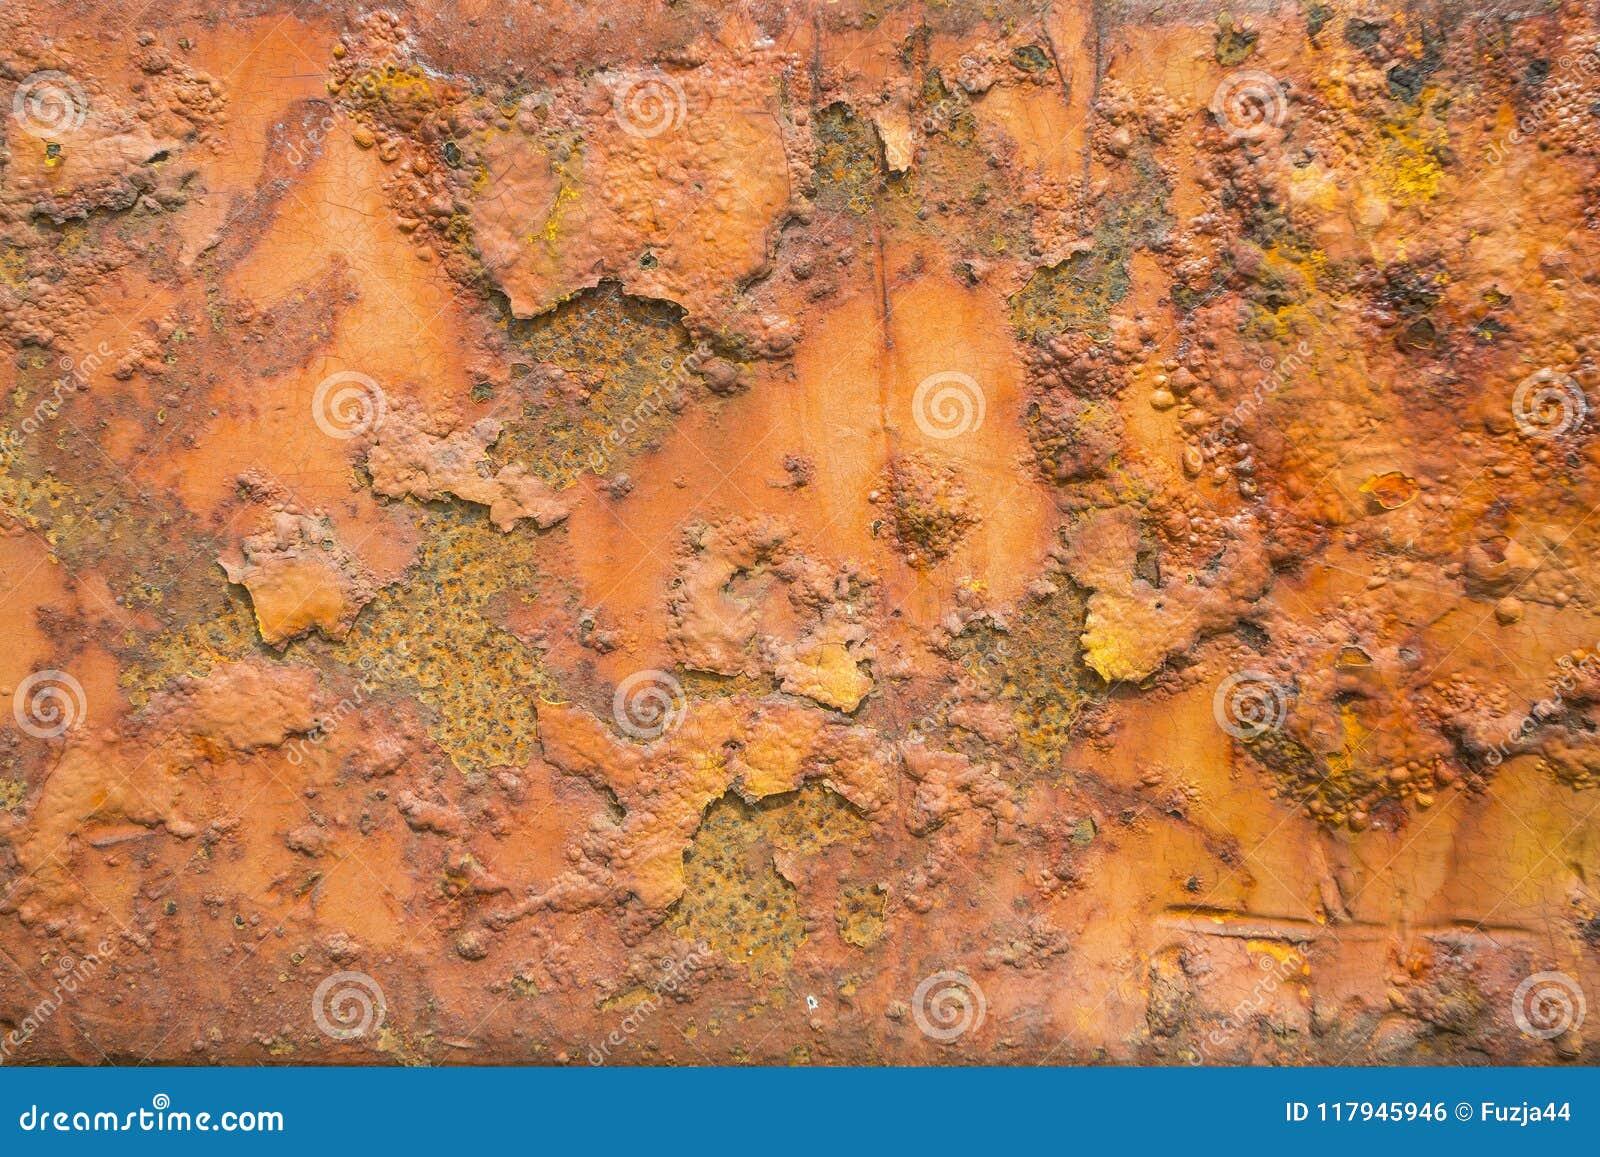 Texture grunge fortement détaillée de fond en métal